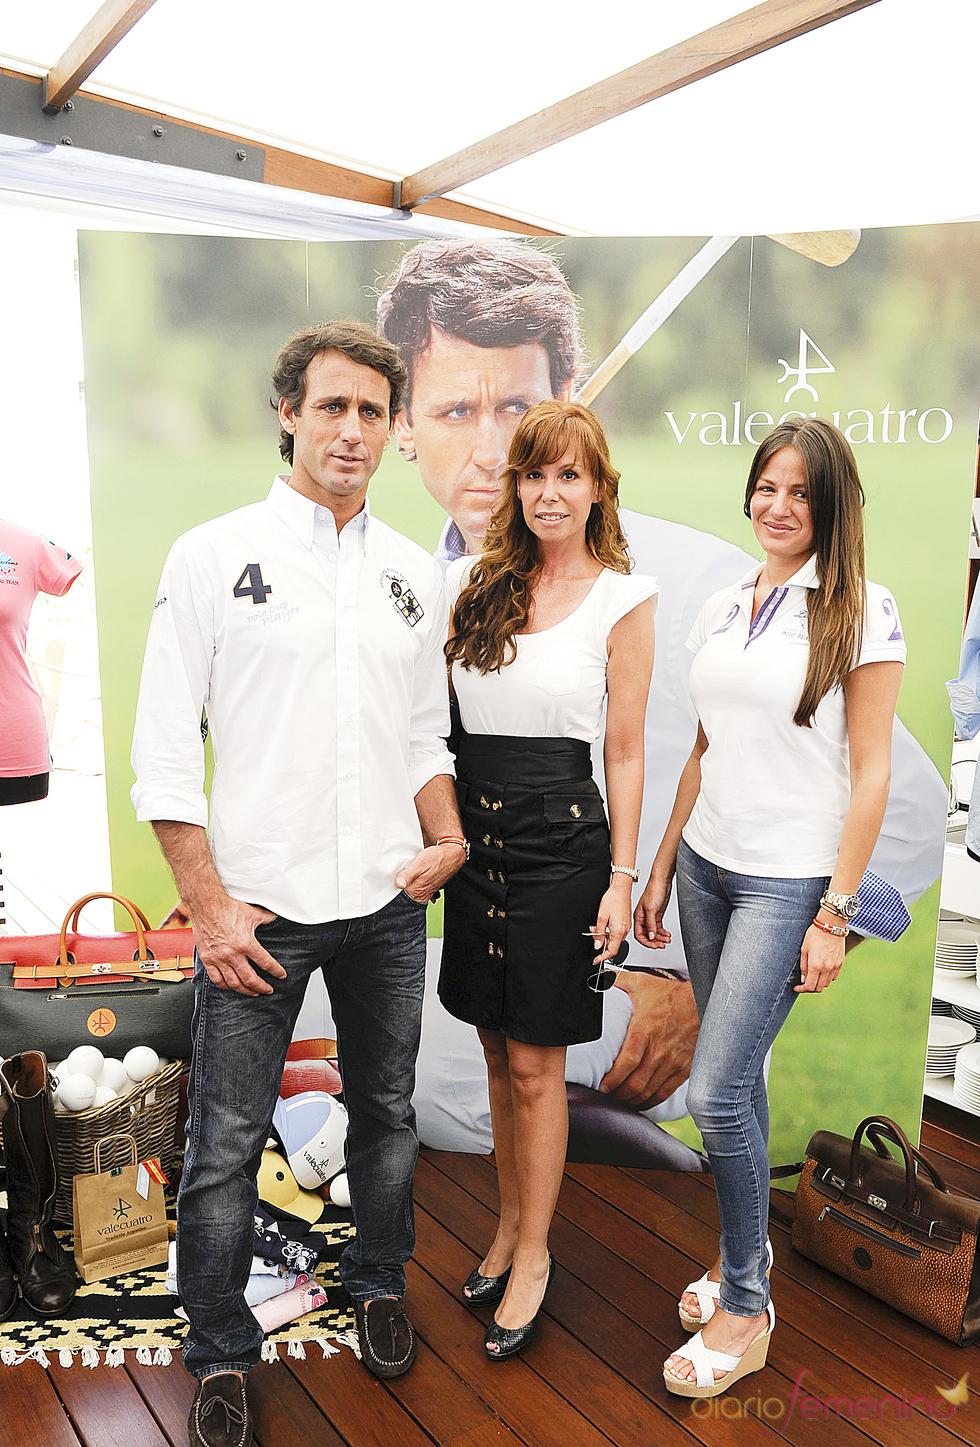 Álvaro Muñoz Escassi, Lara Dibildos y su novia Patricia